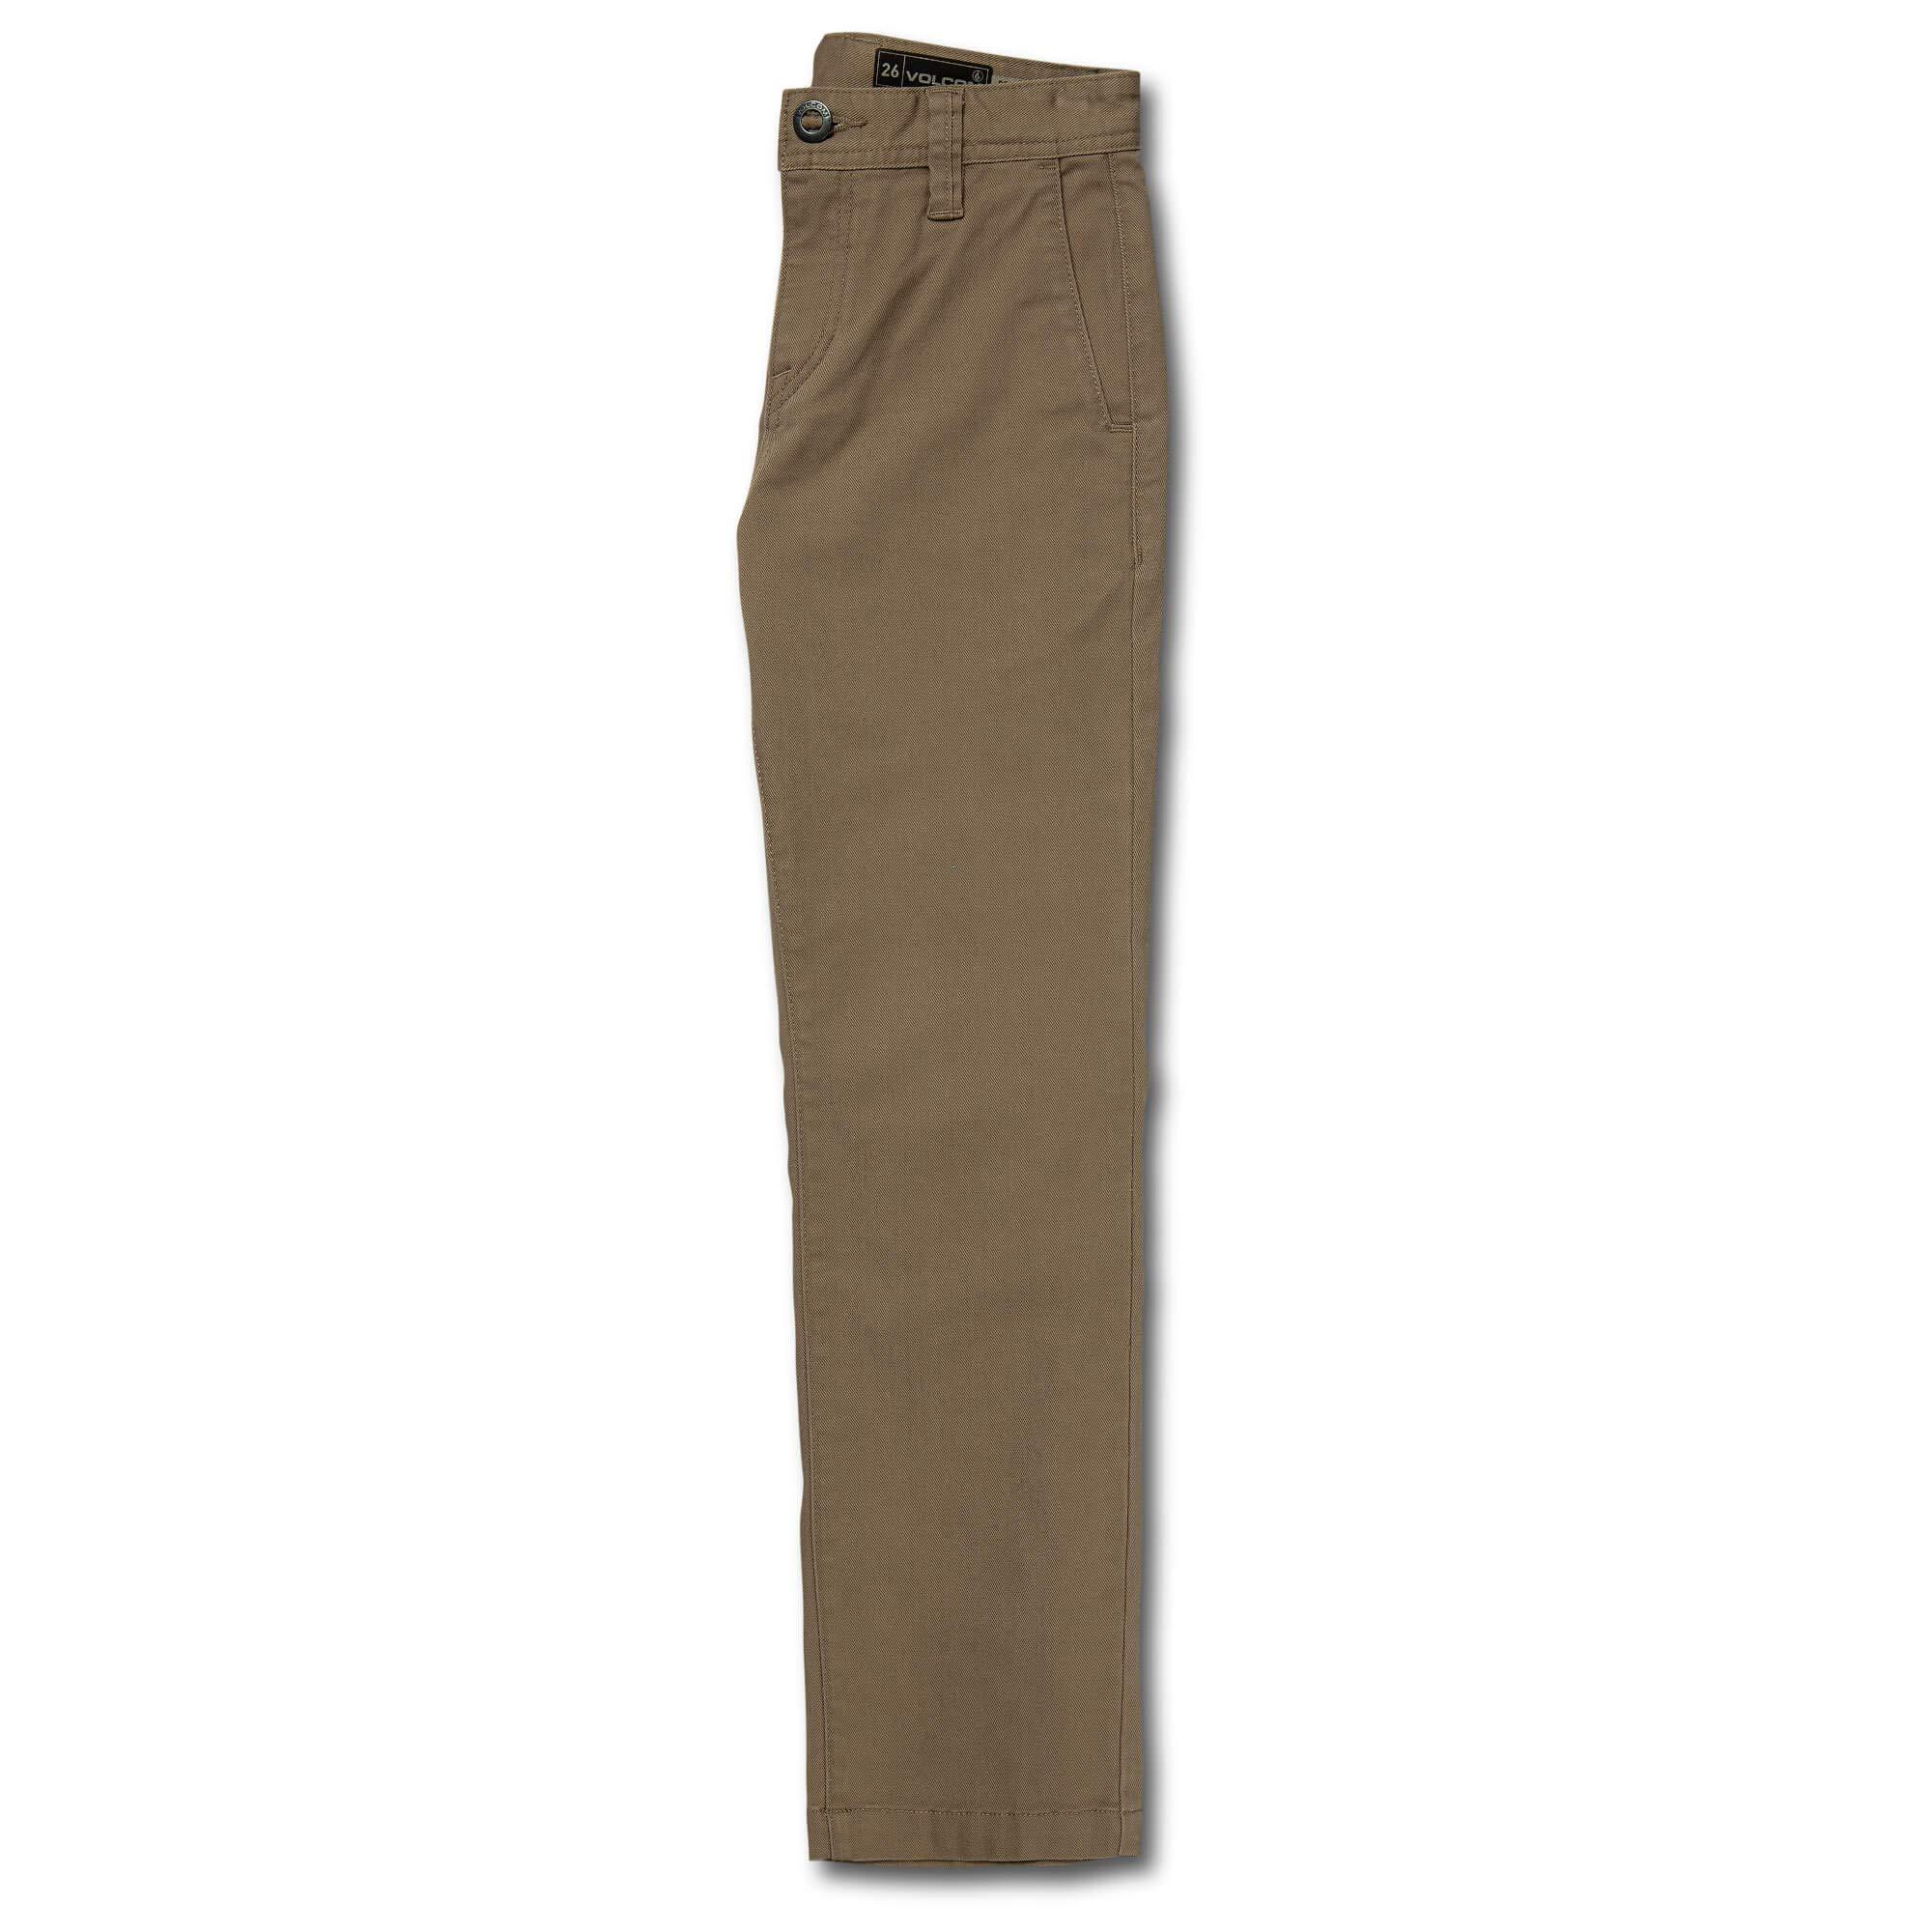 Volcom Big Boys Frickin Regular Fit 15'' Chino Pant, Khaki, 23 by Volcom (Image #3)